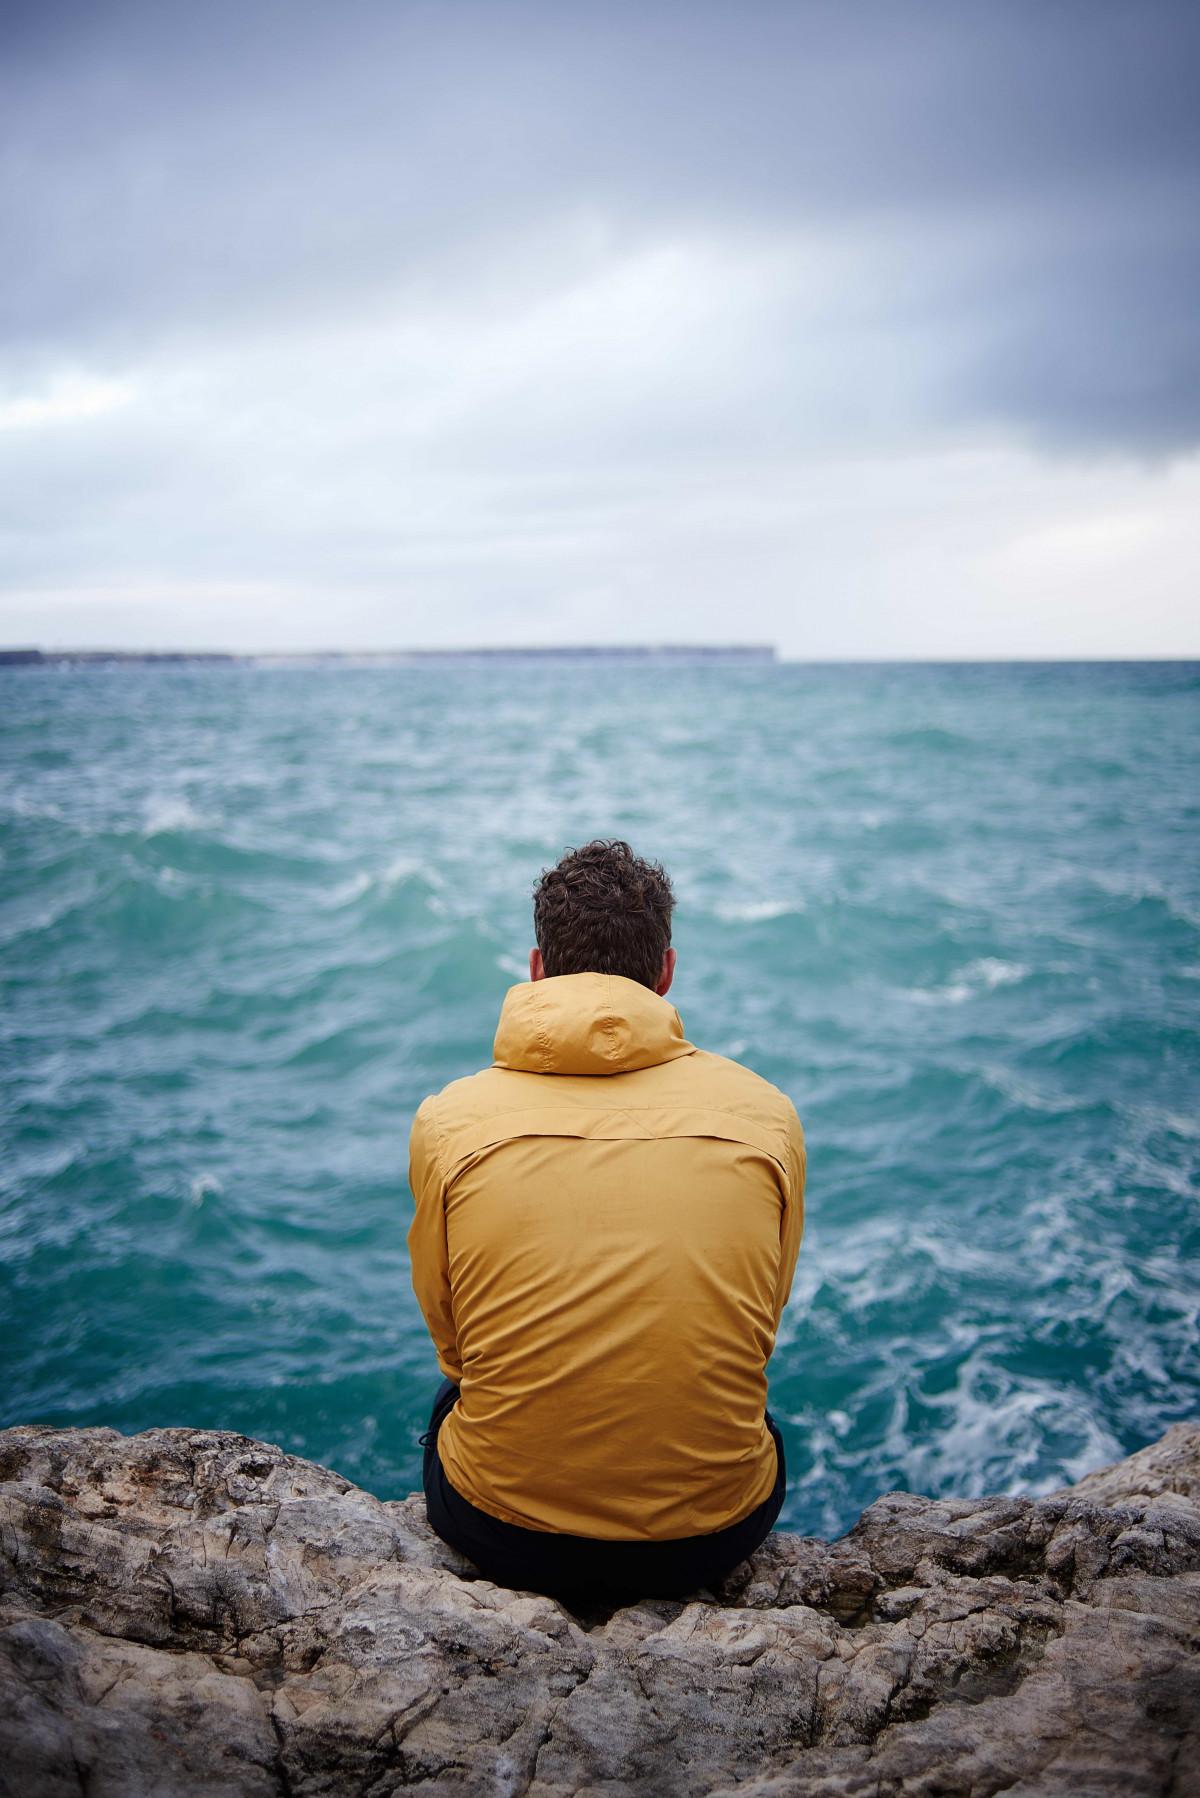 Free Images : man, beach, sea, coast, sand, rock, ocean ...